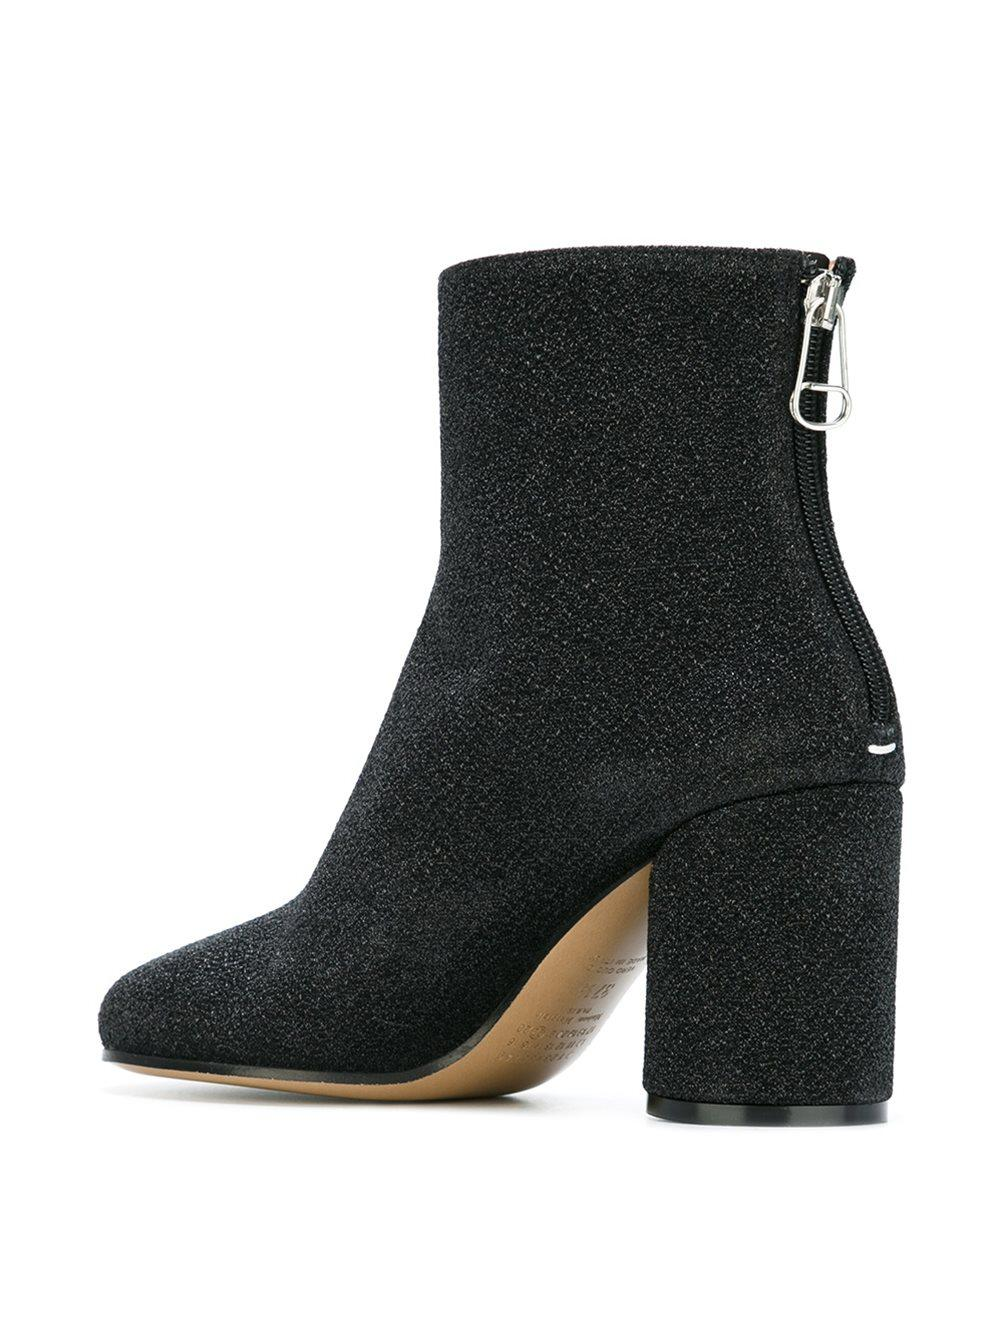 Maison Margiela Cotton 'socks' Ankle Boots in Black (Natural)